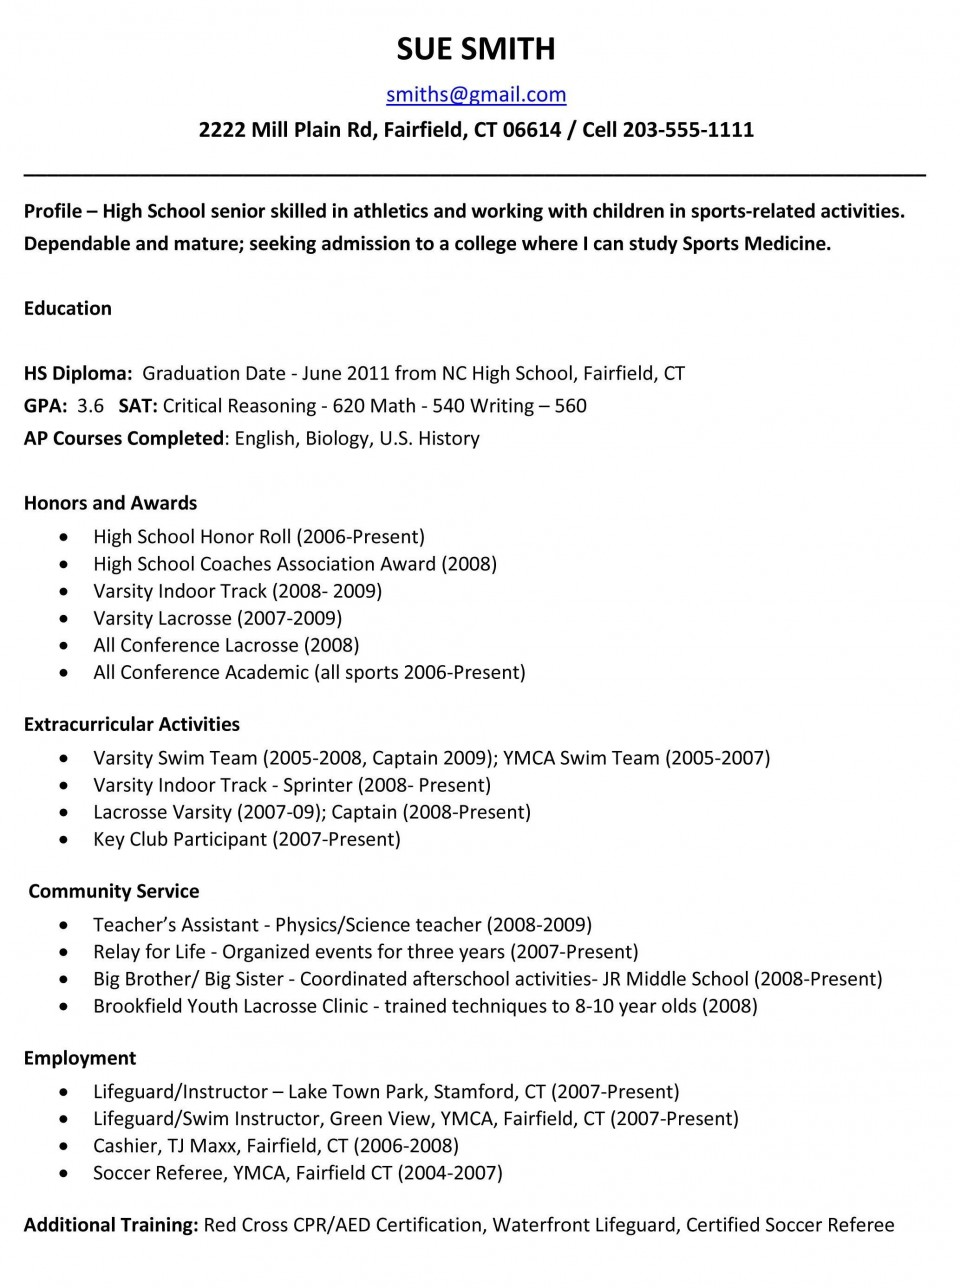 004 Astounding High School Student Resume Template Idea  Free Google Doc960